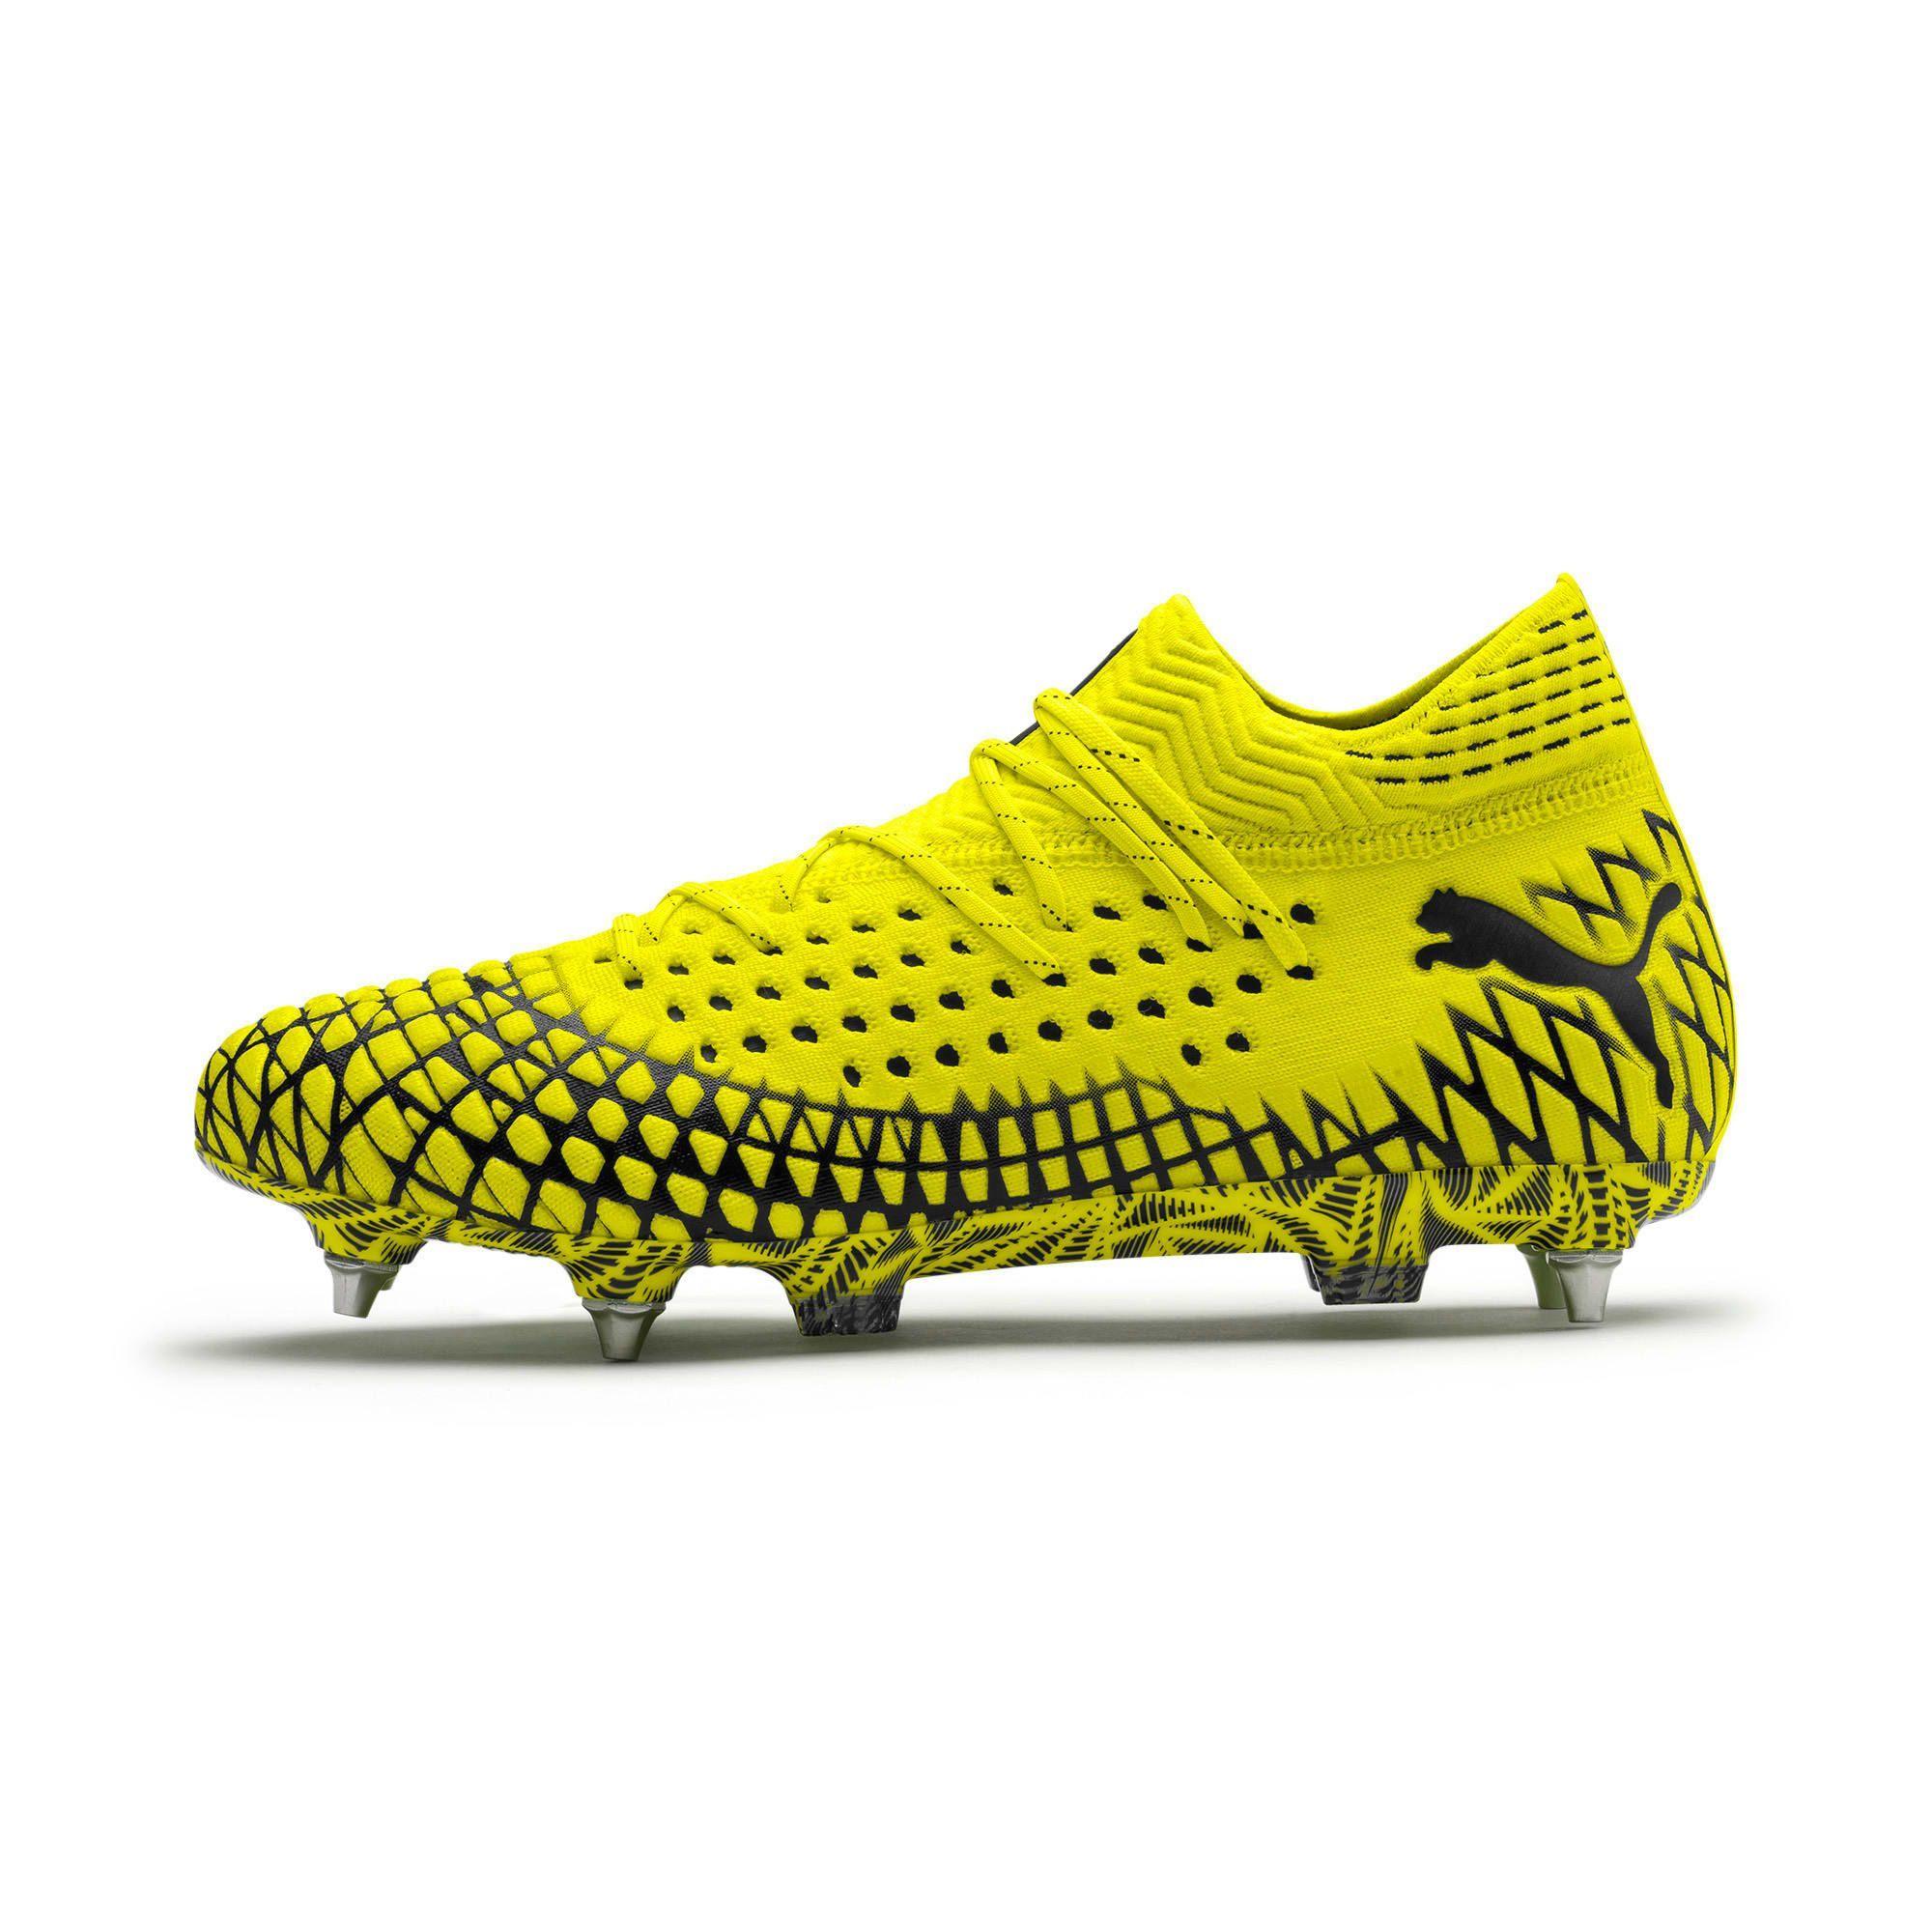 Puma Future 4 1 Netfit Mxsg Football Boots In Yellow Alert Black Size 10 5 Alertblack Boots Football Futur Football Boots Mens Football Boots Black Puma